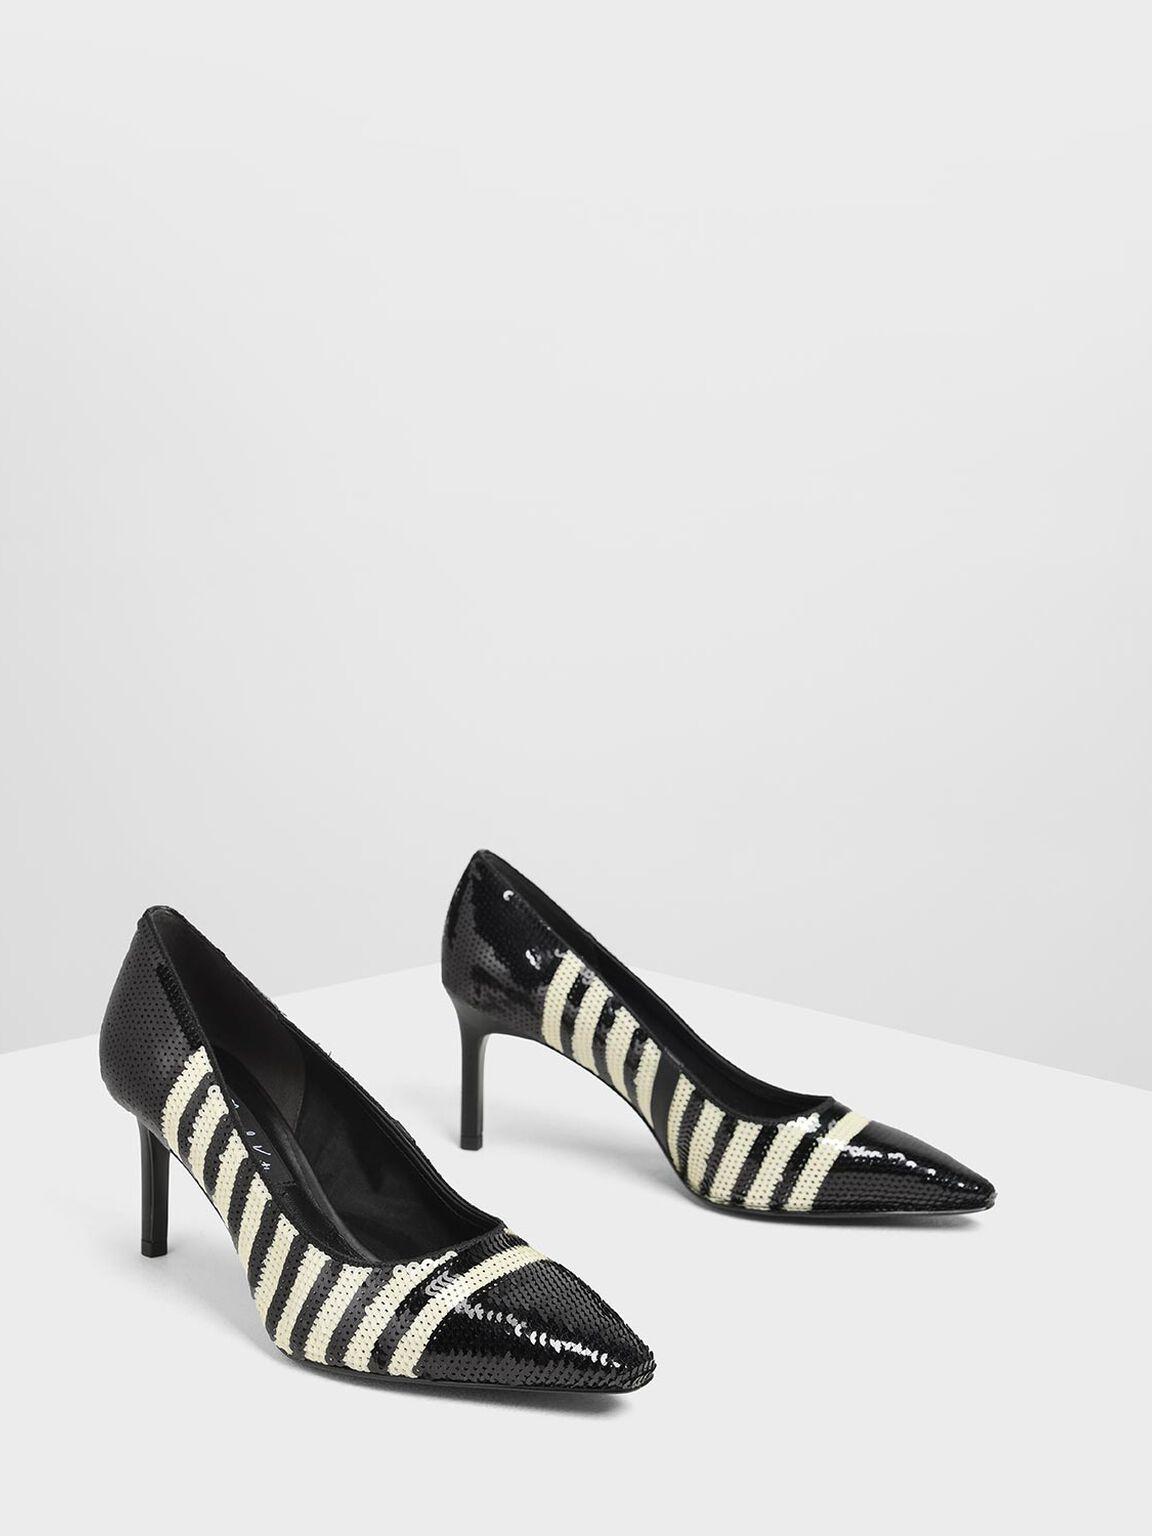 Sequin Mesh Pointed Toe Pumps, Black Textured, hi-res